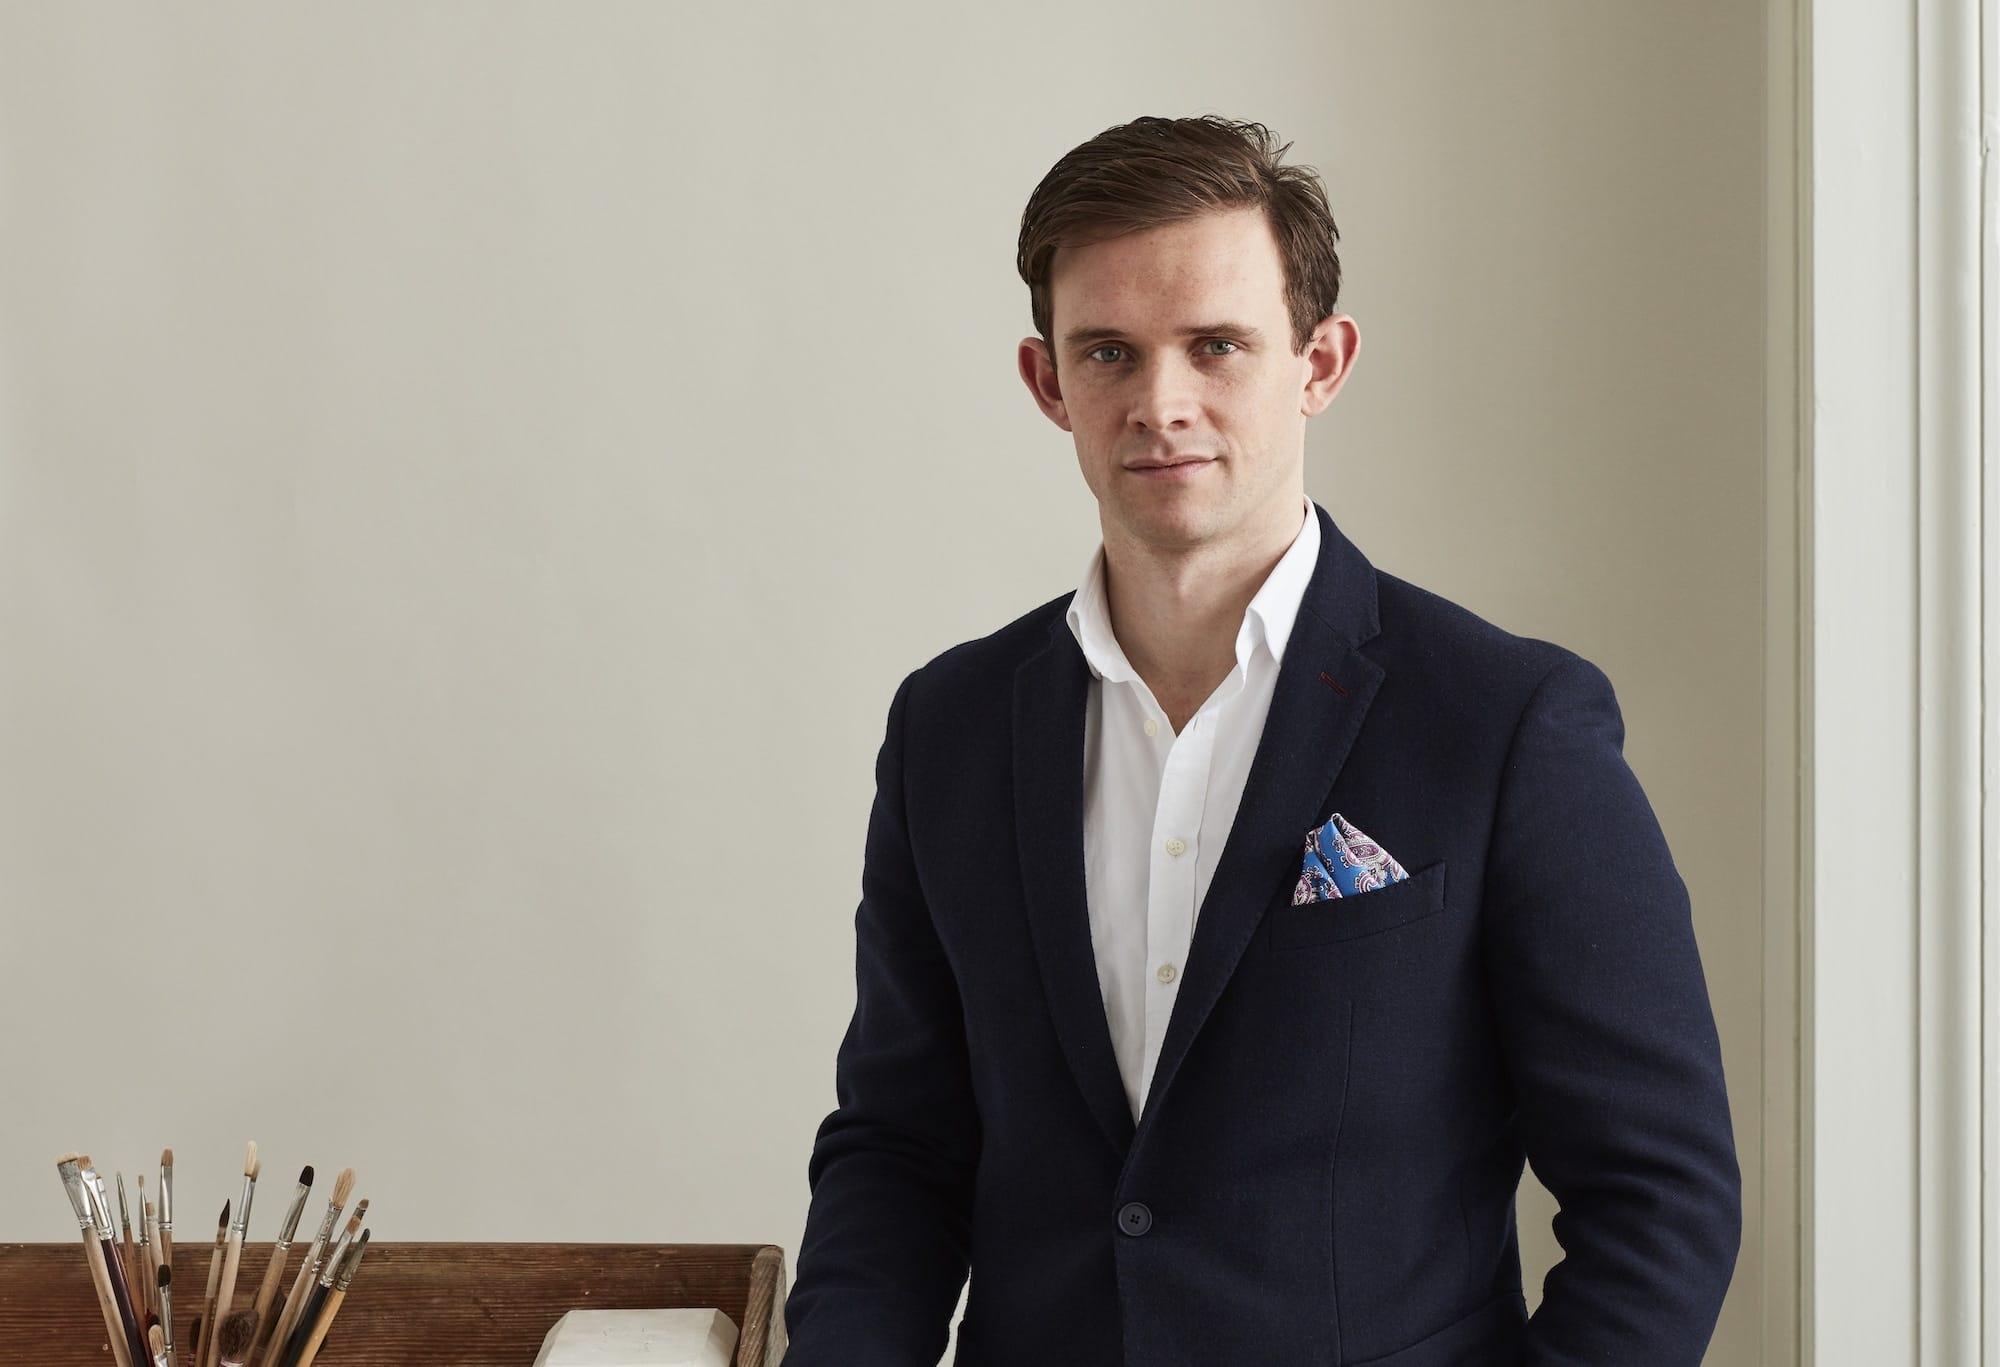 Q&A: Alex Innes, Rolls-Royce's Head of Coachbuild Design takes us inside the bespoke process